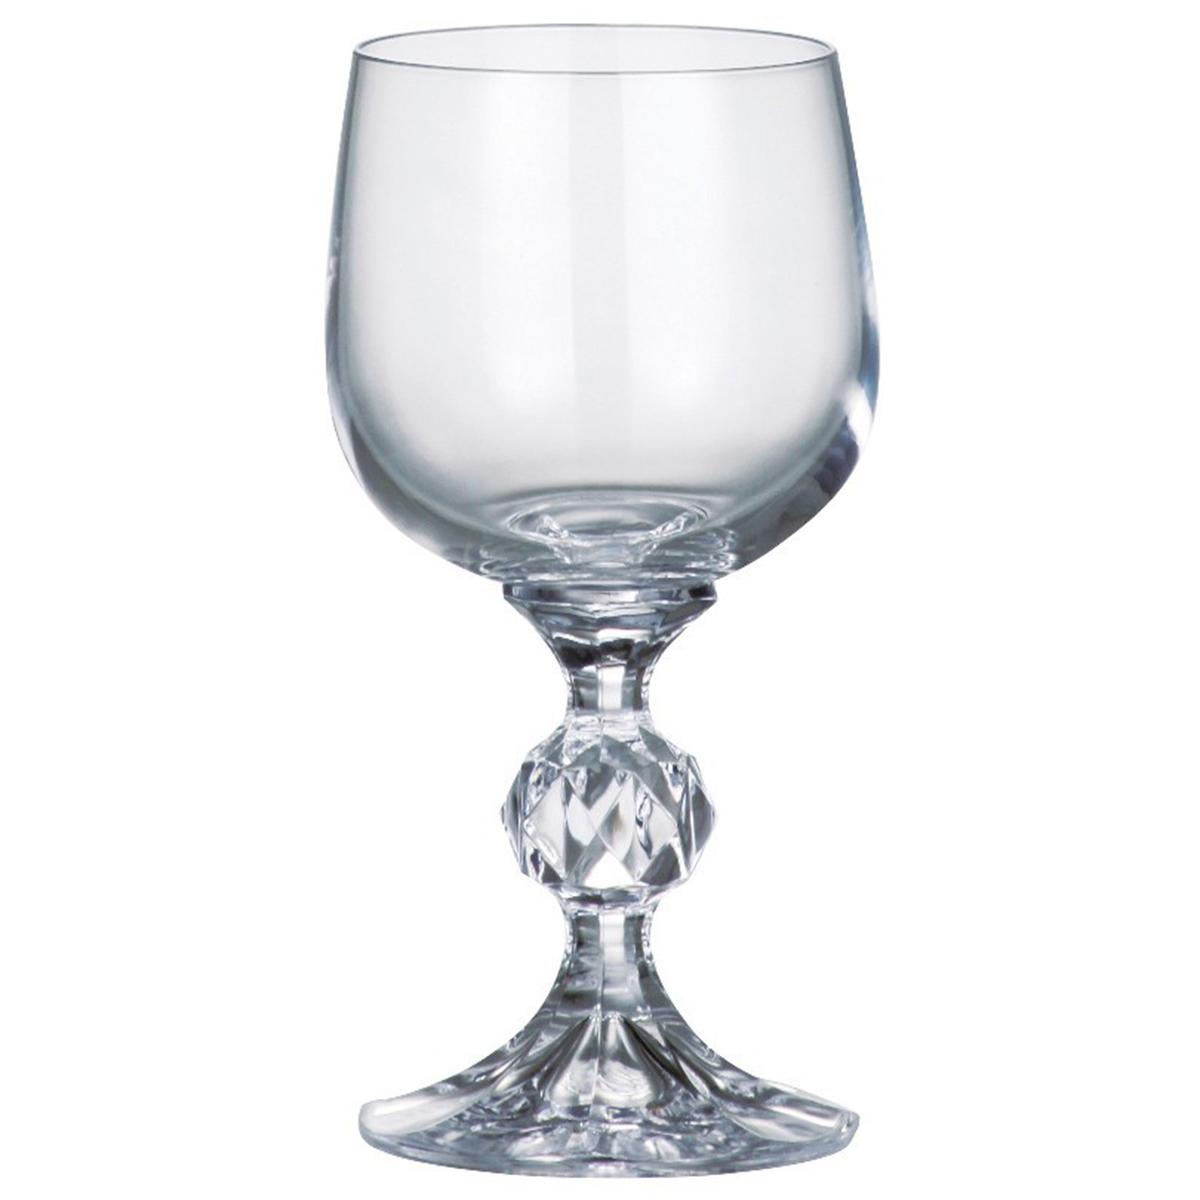 Набор бокалов для вина Bohemia Crystal Клаудия, 230 мл, 6 шт. 40149/230 набор бокалов для вина bohemia crystal attimo 500 мл 6 шт